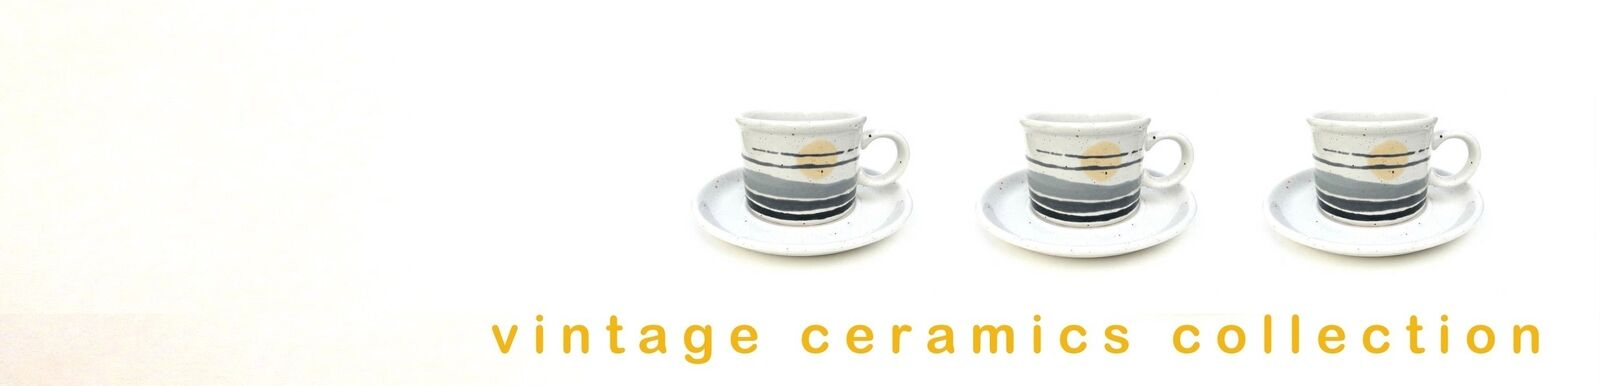 vintage ceramics collection